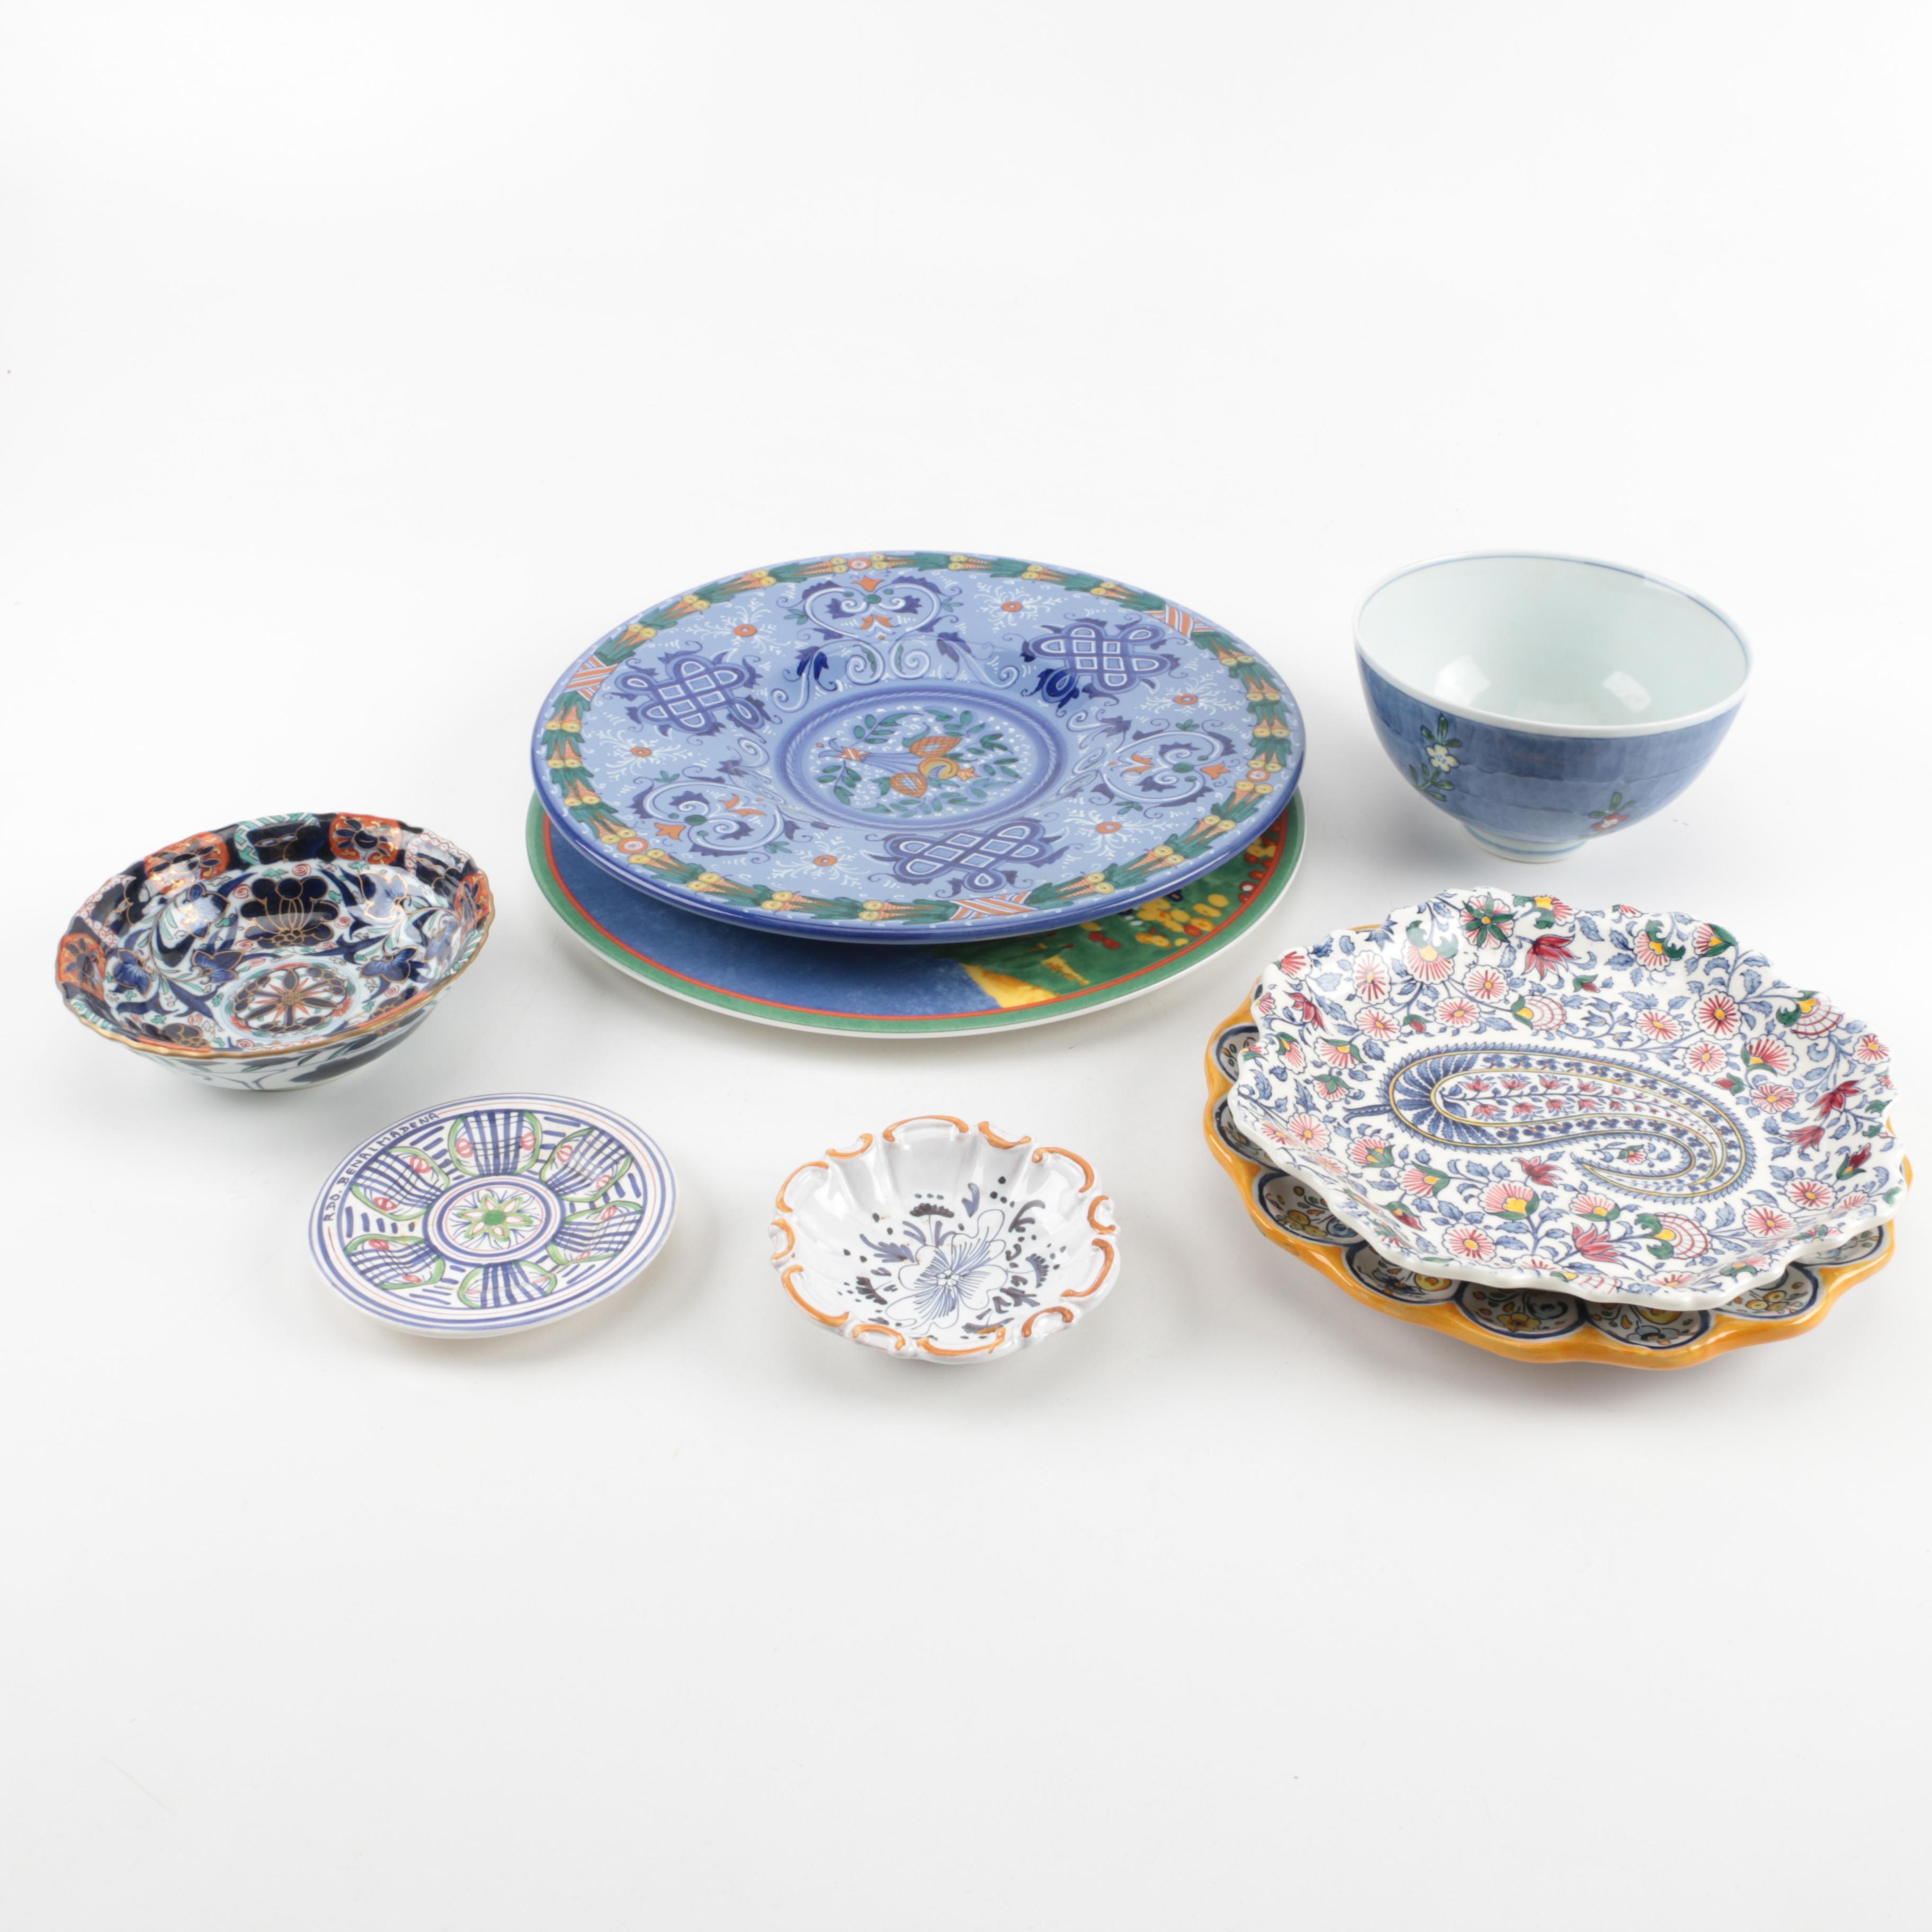 International Hand Painted Ceramic Servingware